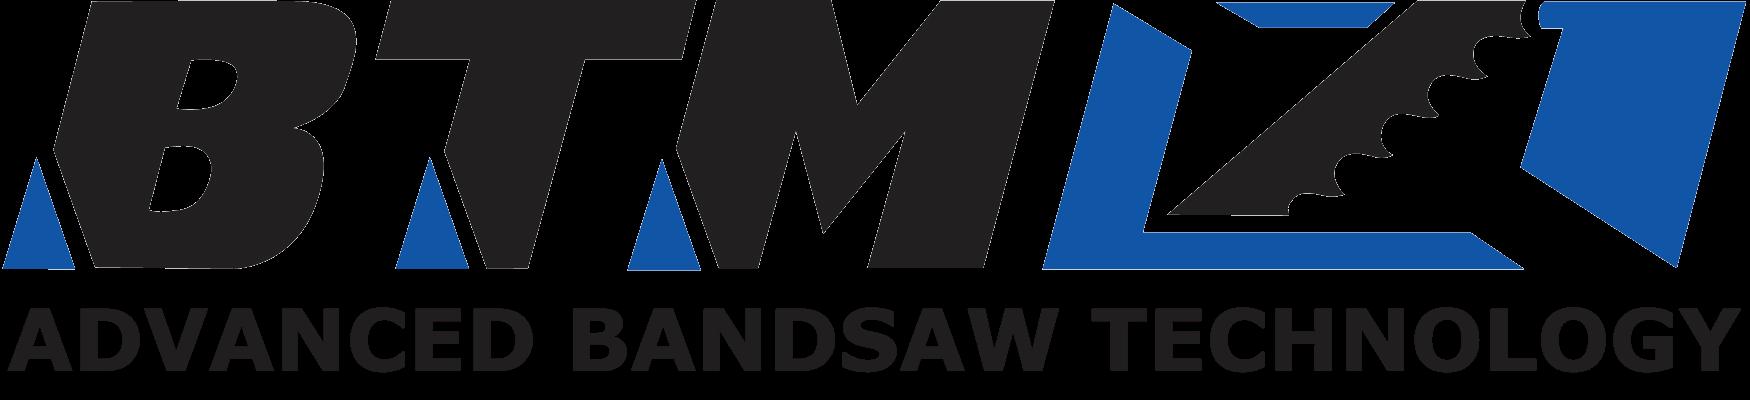 BTM Bandsaws North America